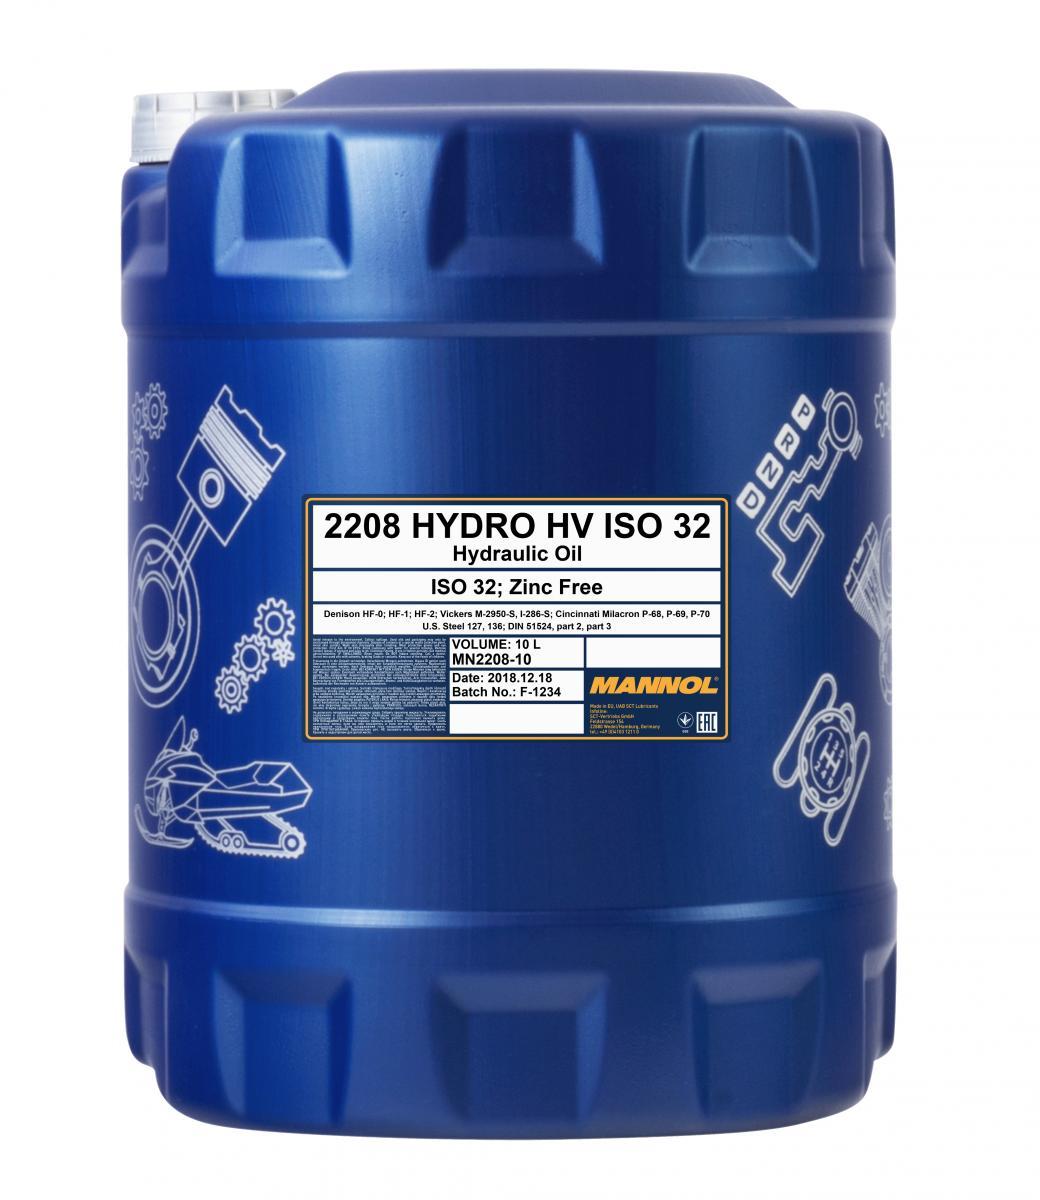 Hydro HV ISO 32 Zinc Free